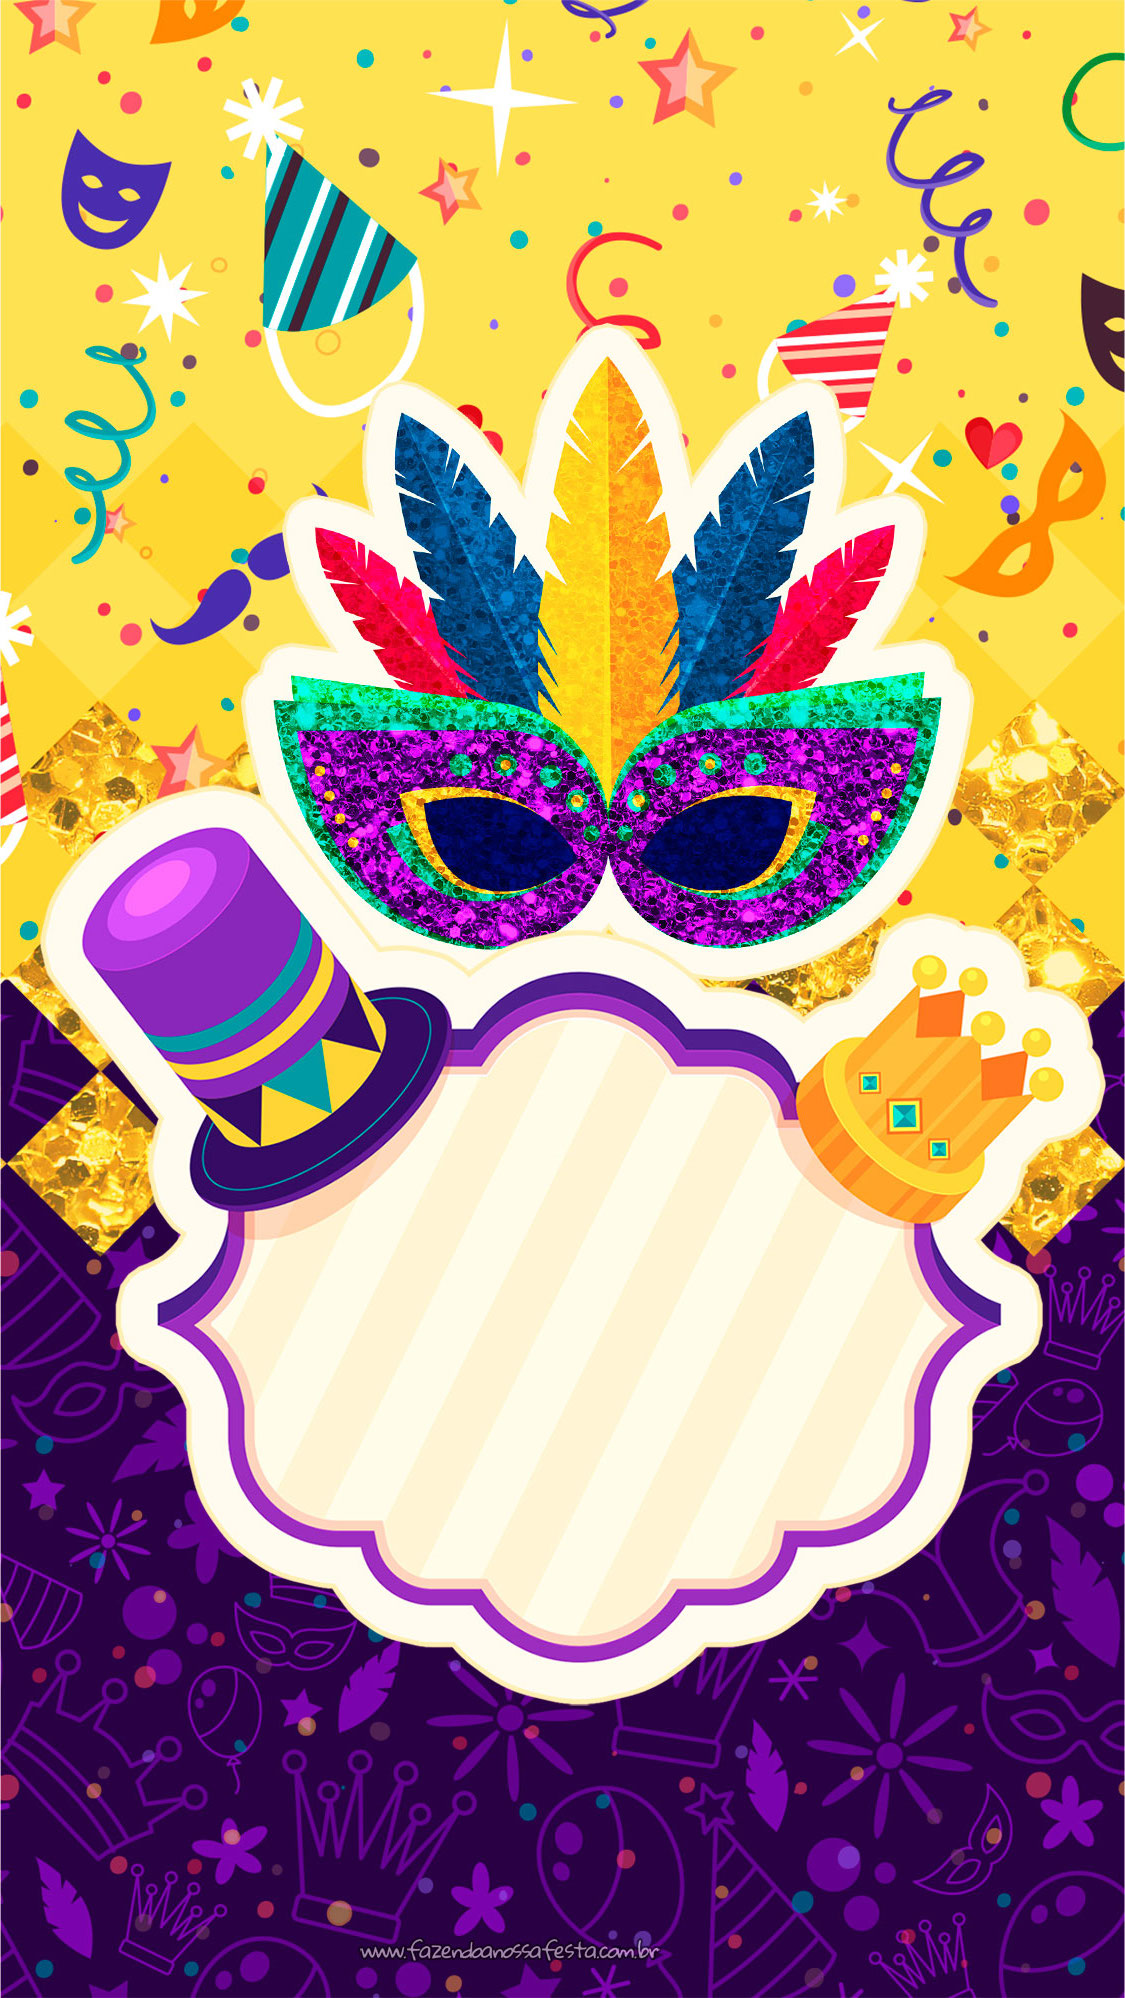 Convite para Celular de Carnaval